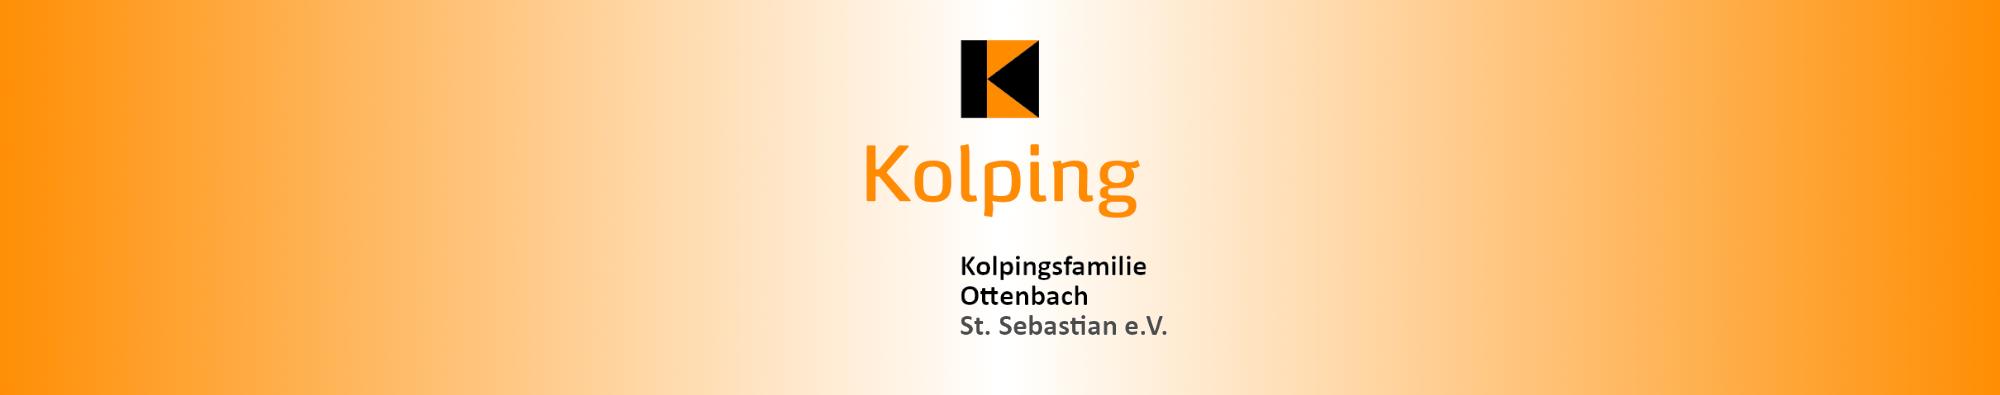 Kolpingsfamilie Ottenbach